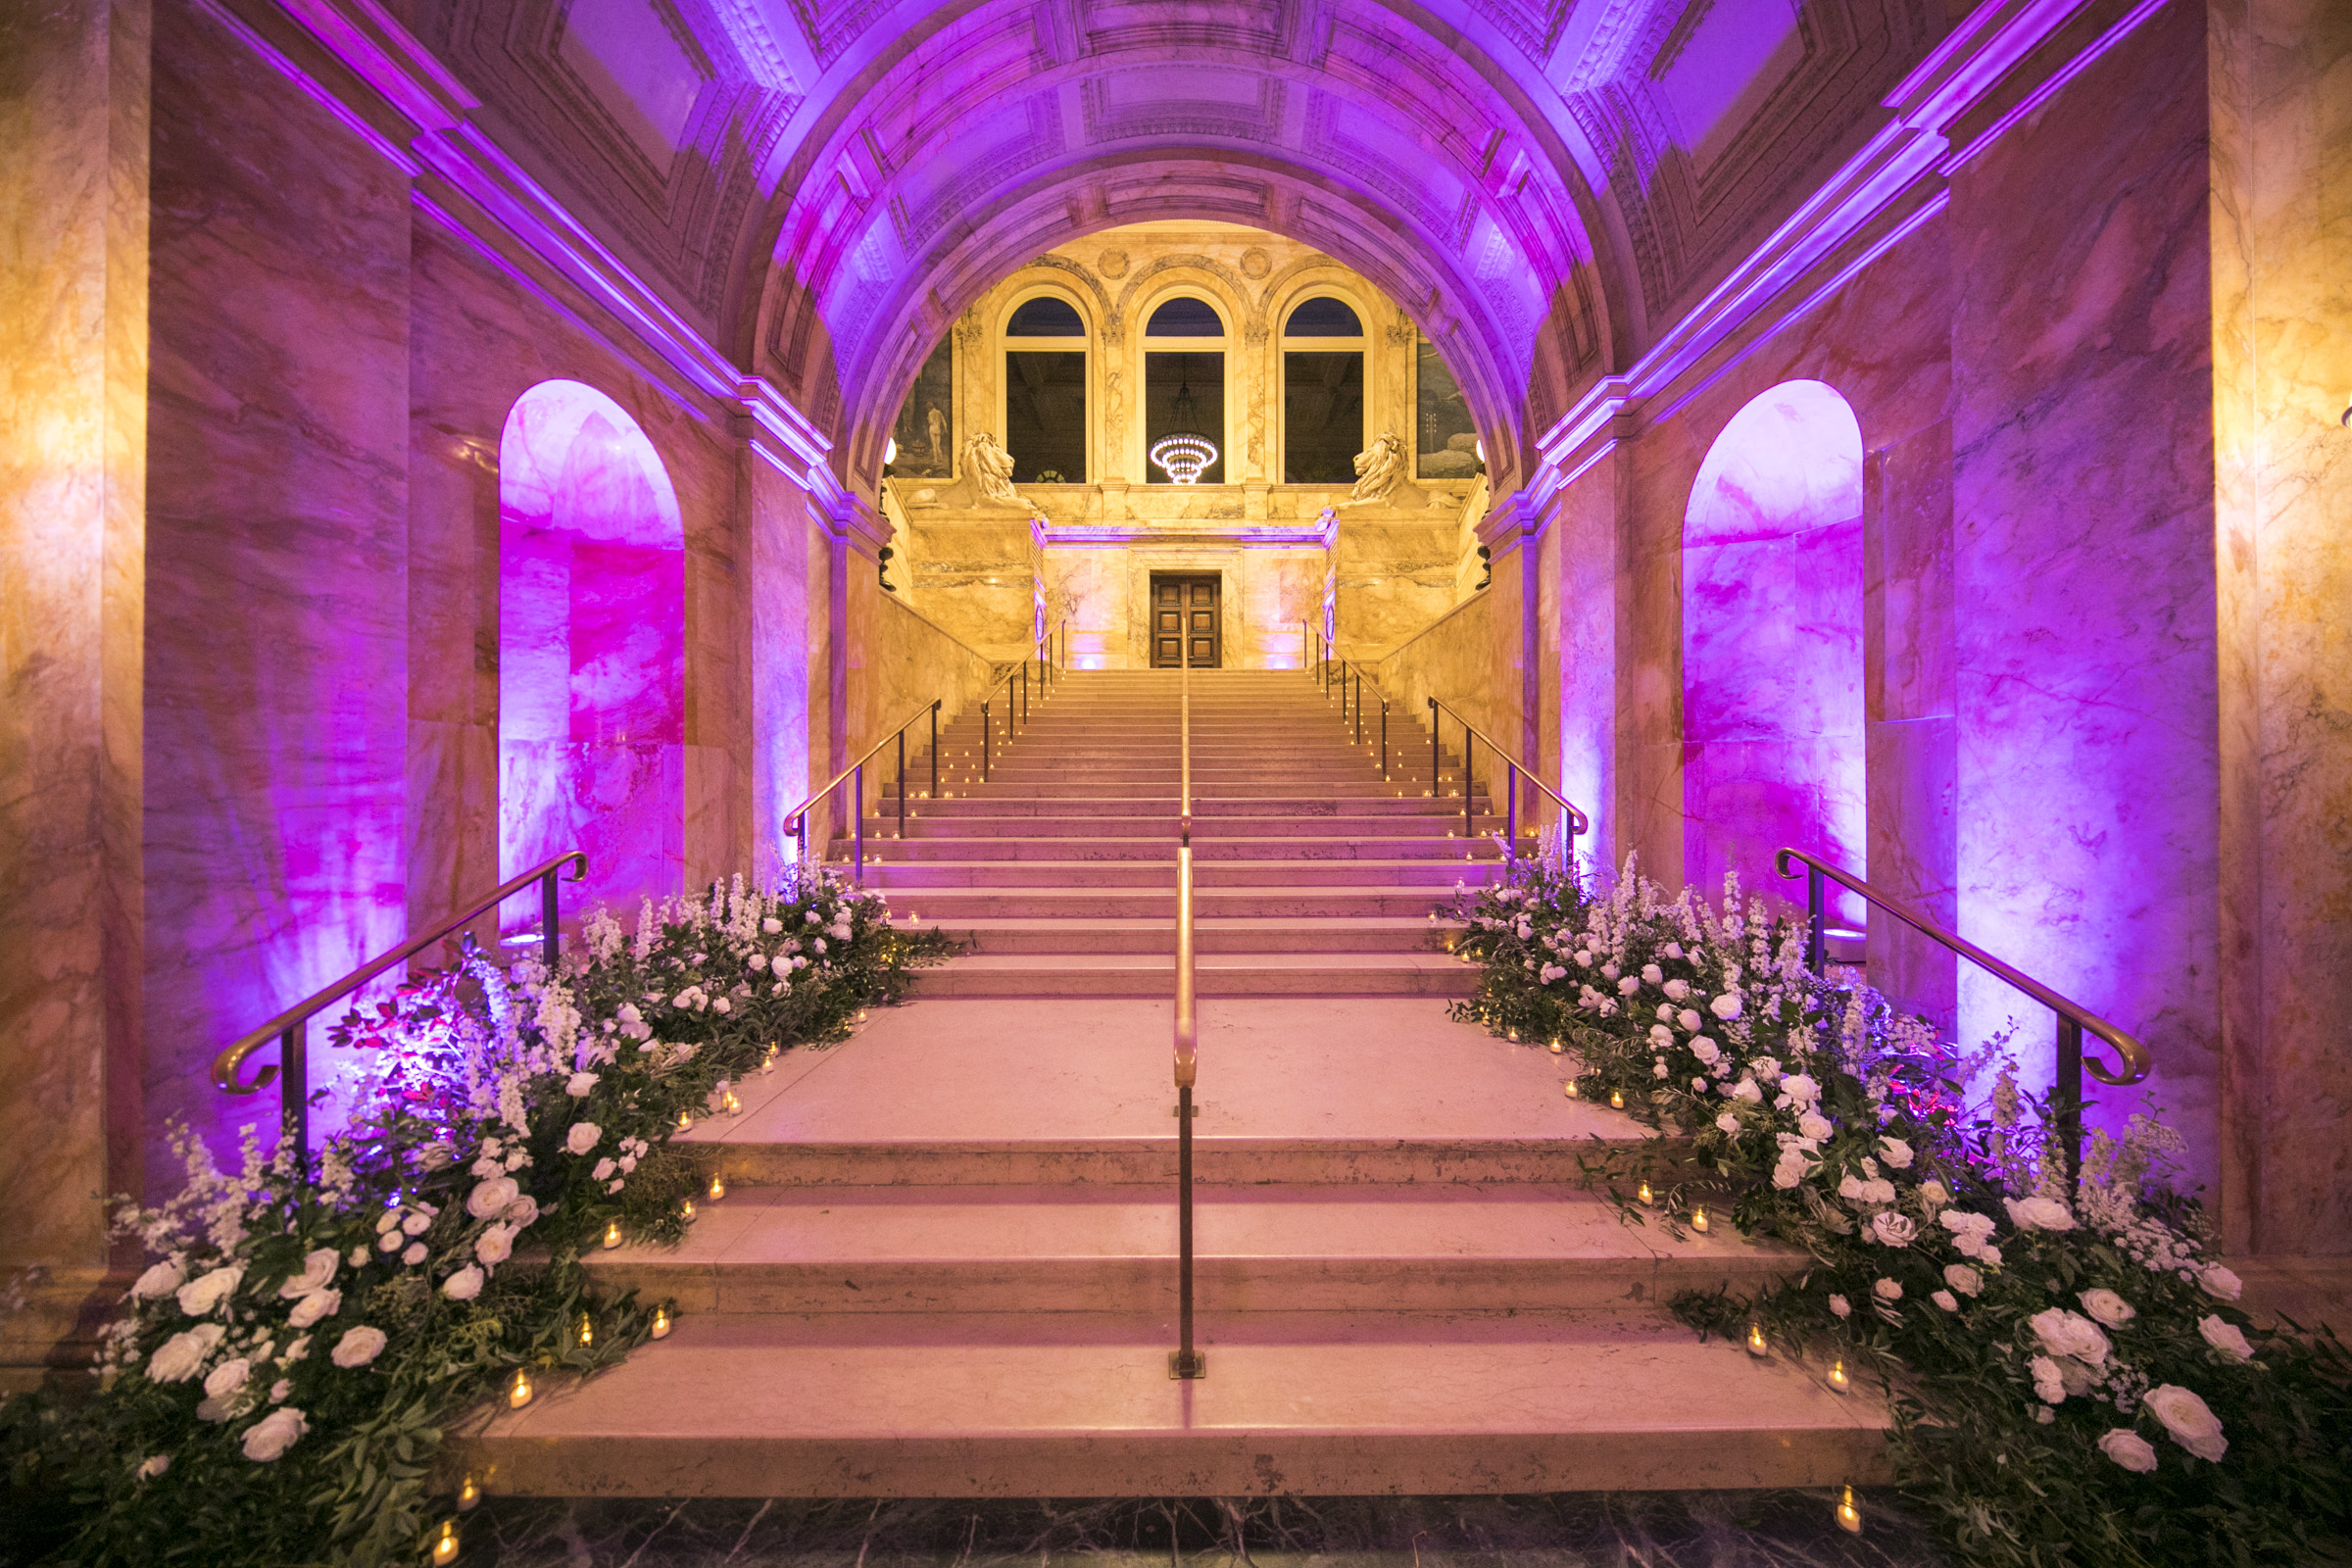 Boston Public Library Dramatic Archway Lighting Port Lighting Systems Rafanelli Events.jpg